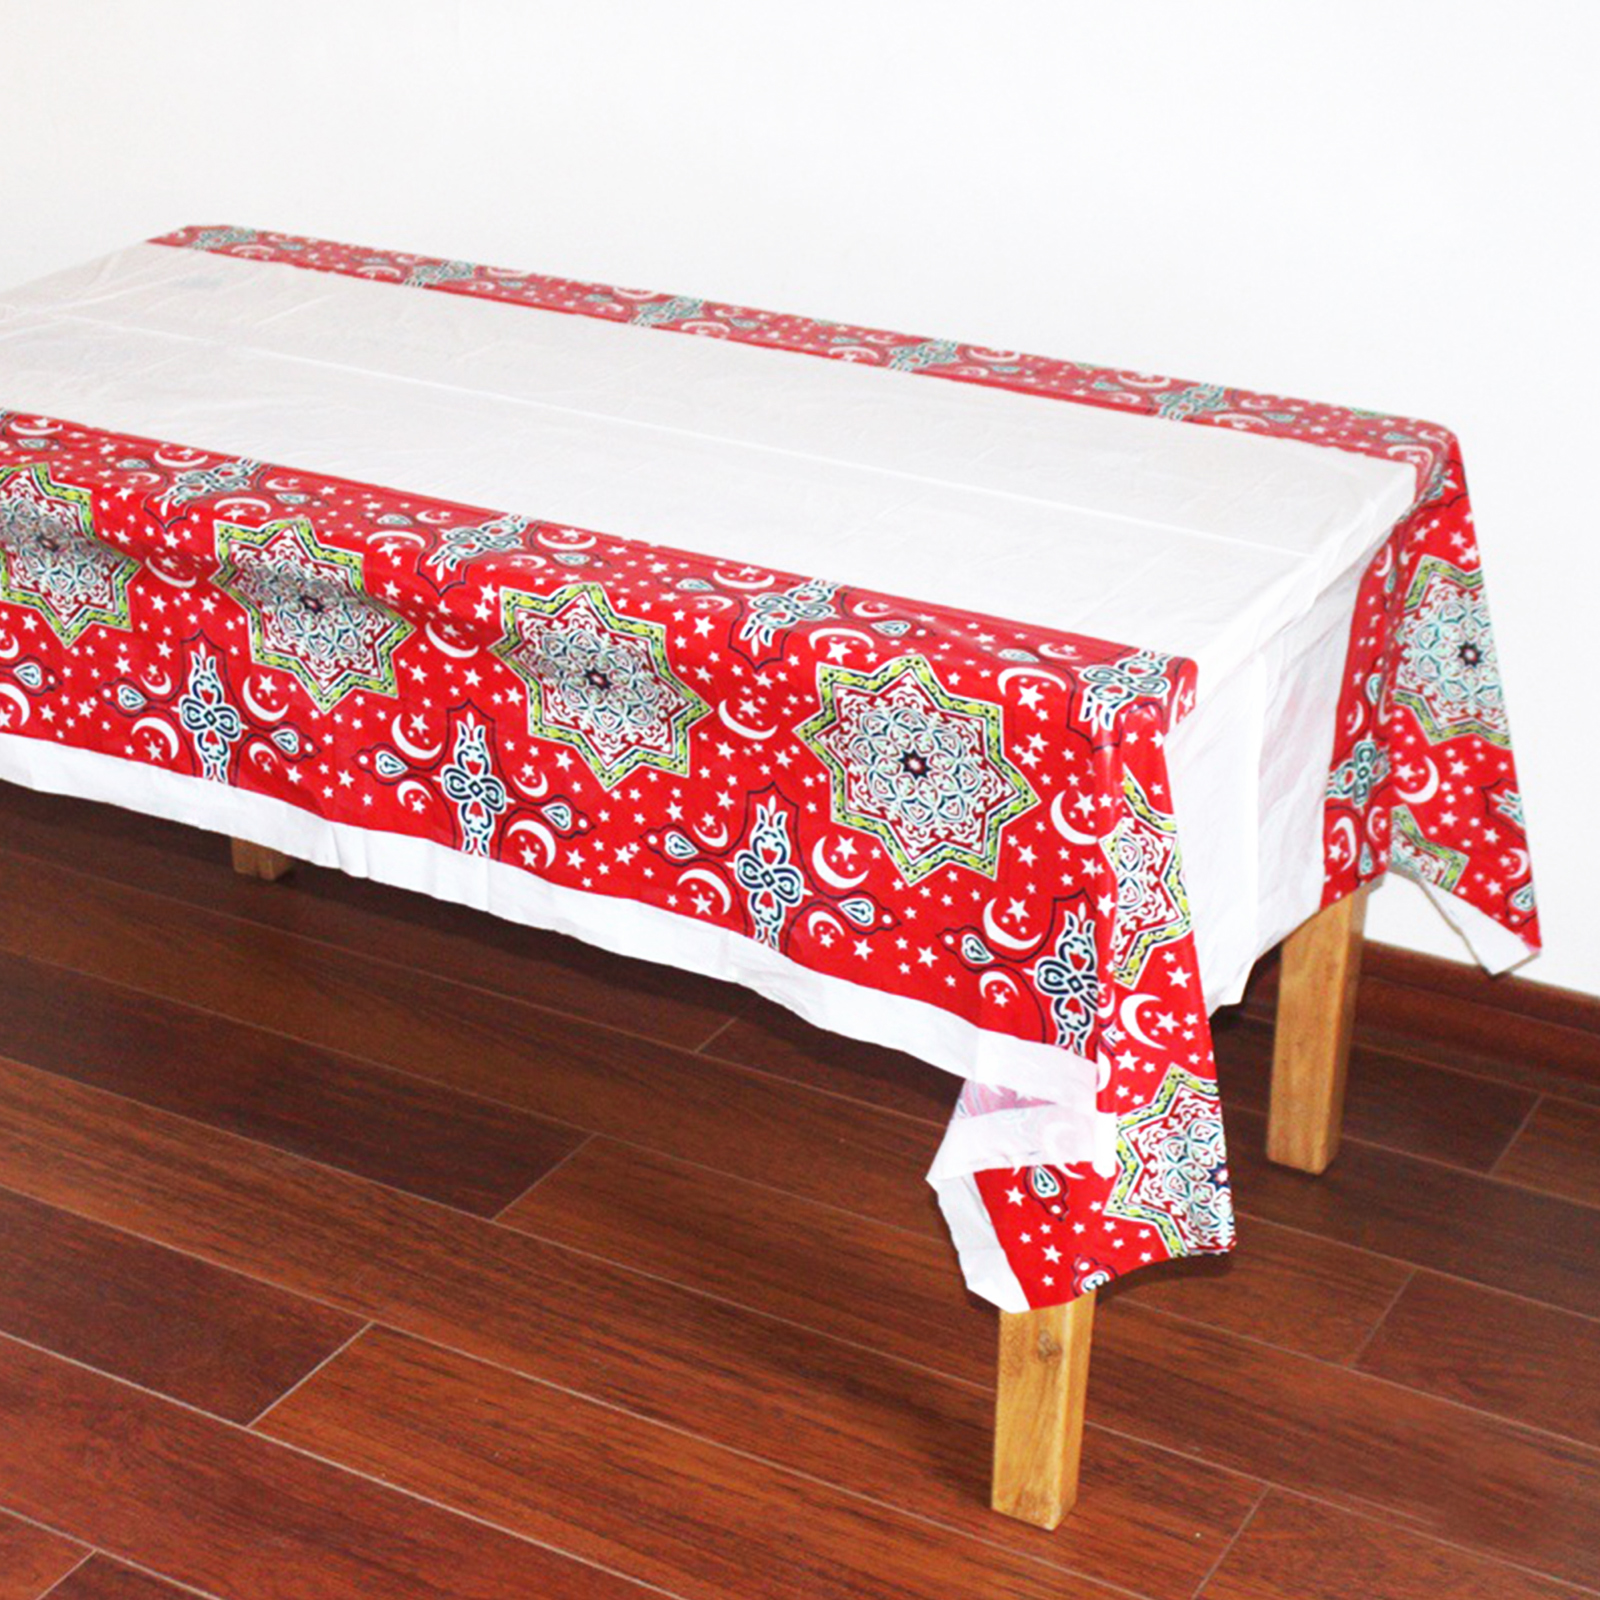 1pcs 108x180cm Plastic Table Cloth Eid Mubarak Table Cover Tablecloth For Moslem Islamic Ramadan Place Party Home Decoration